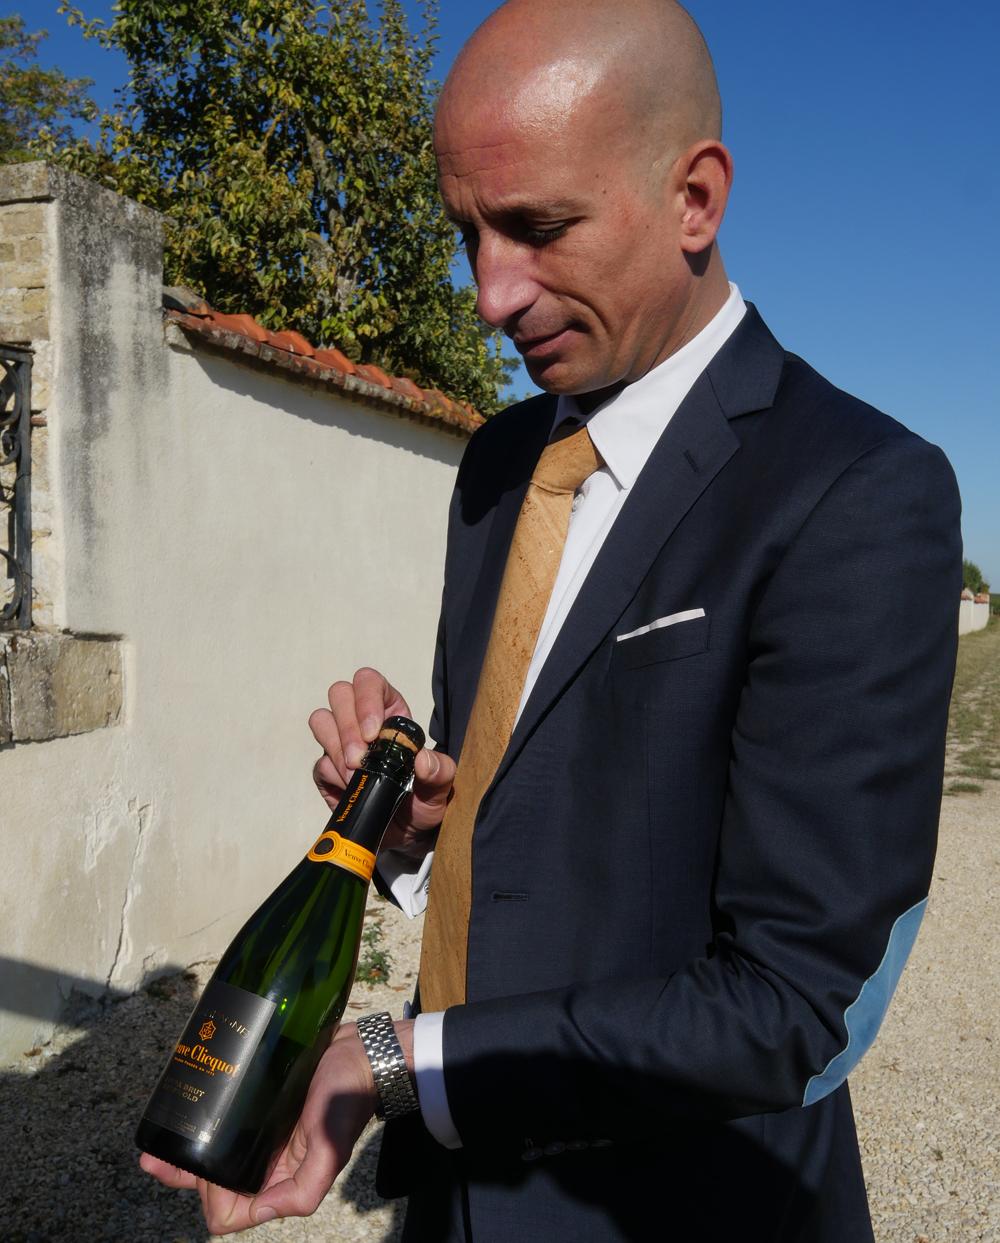 Tasting Veuve Clicquot Champagne